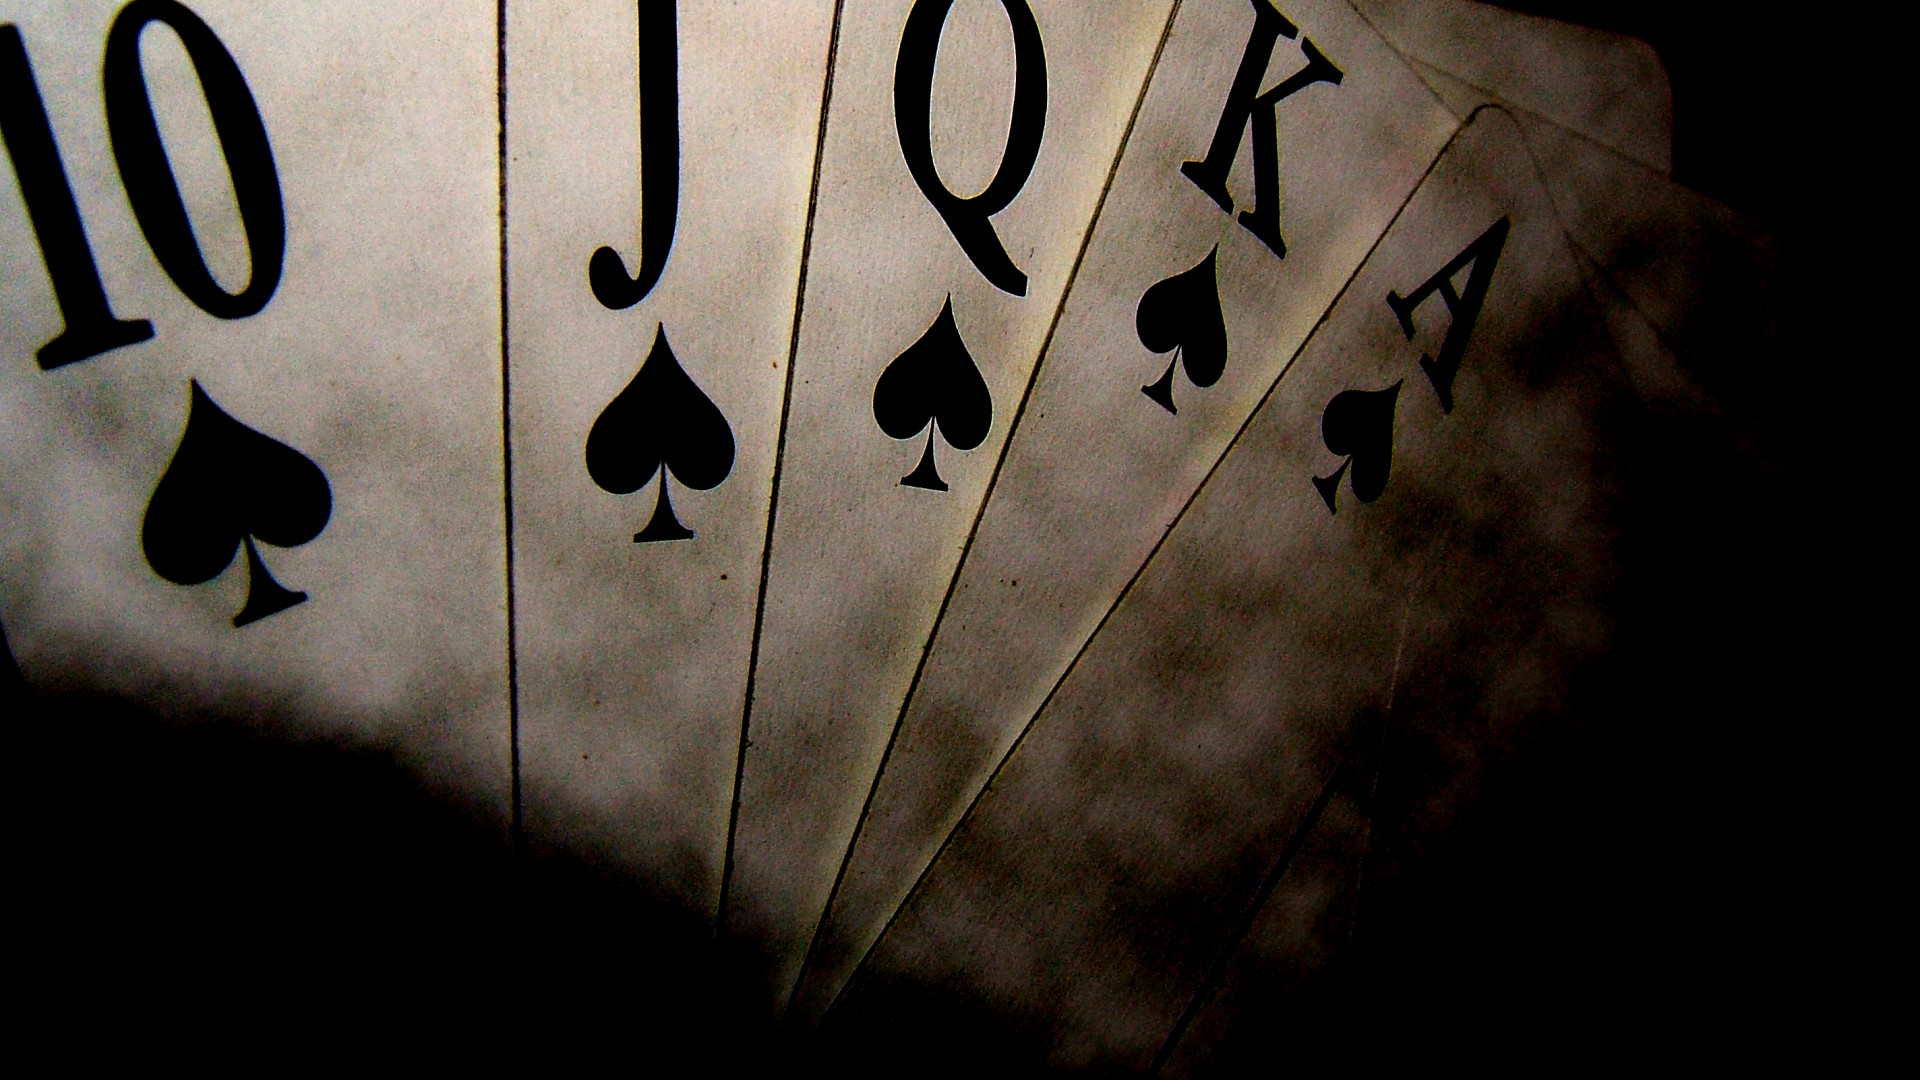 vivere giocando a poker